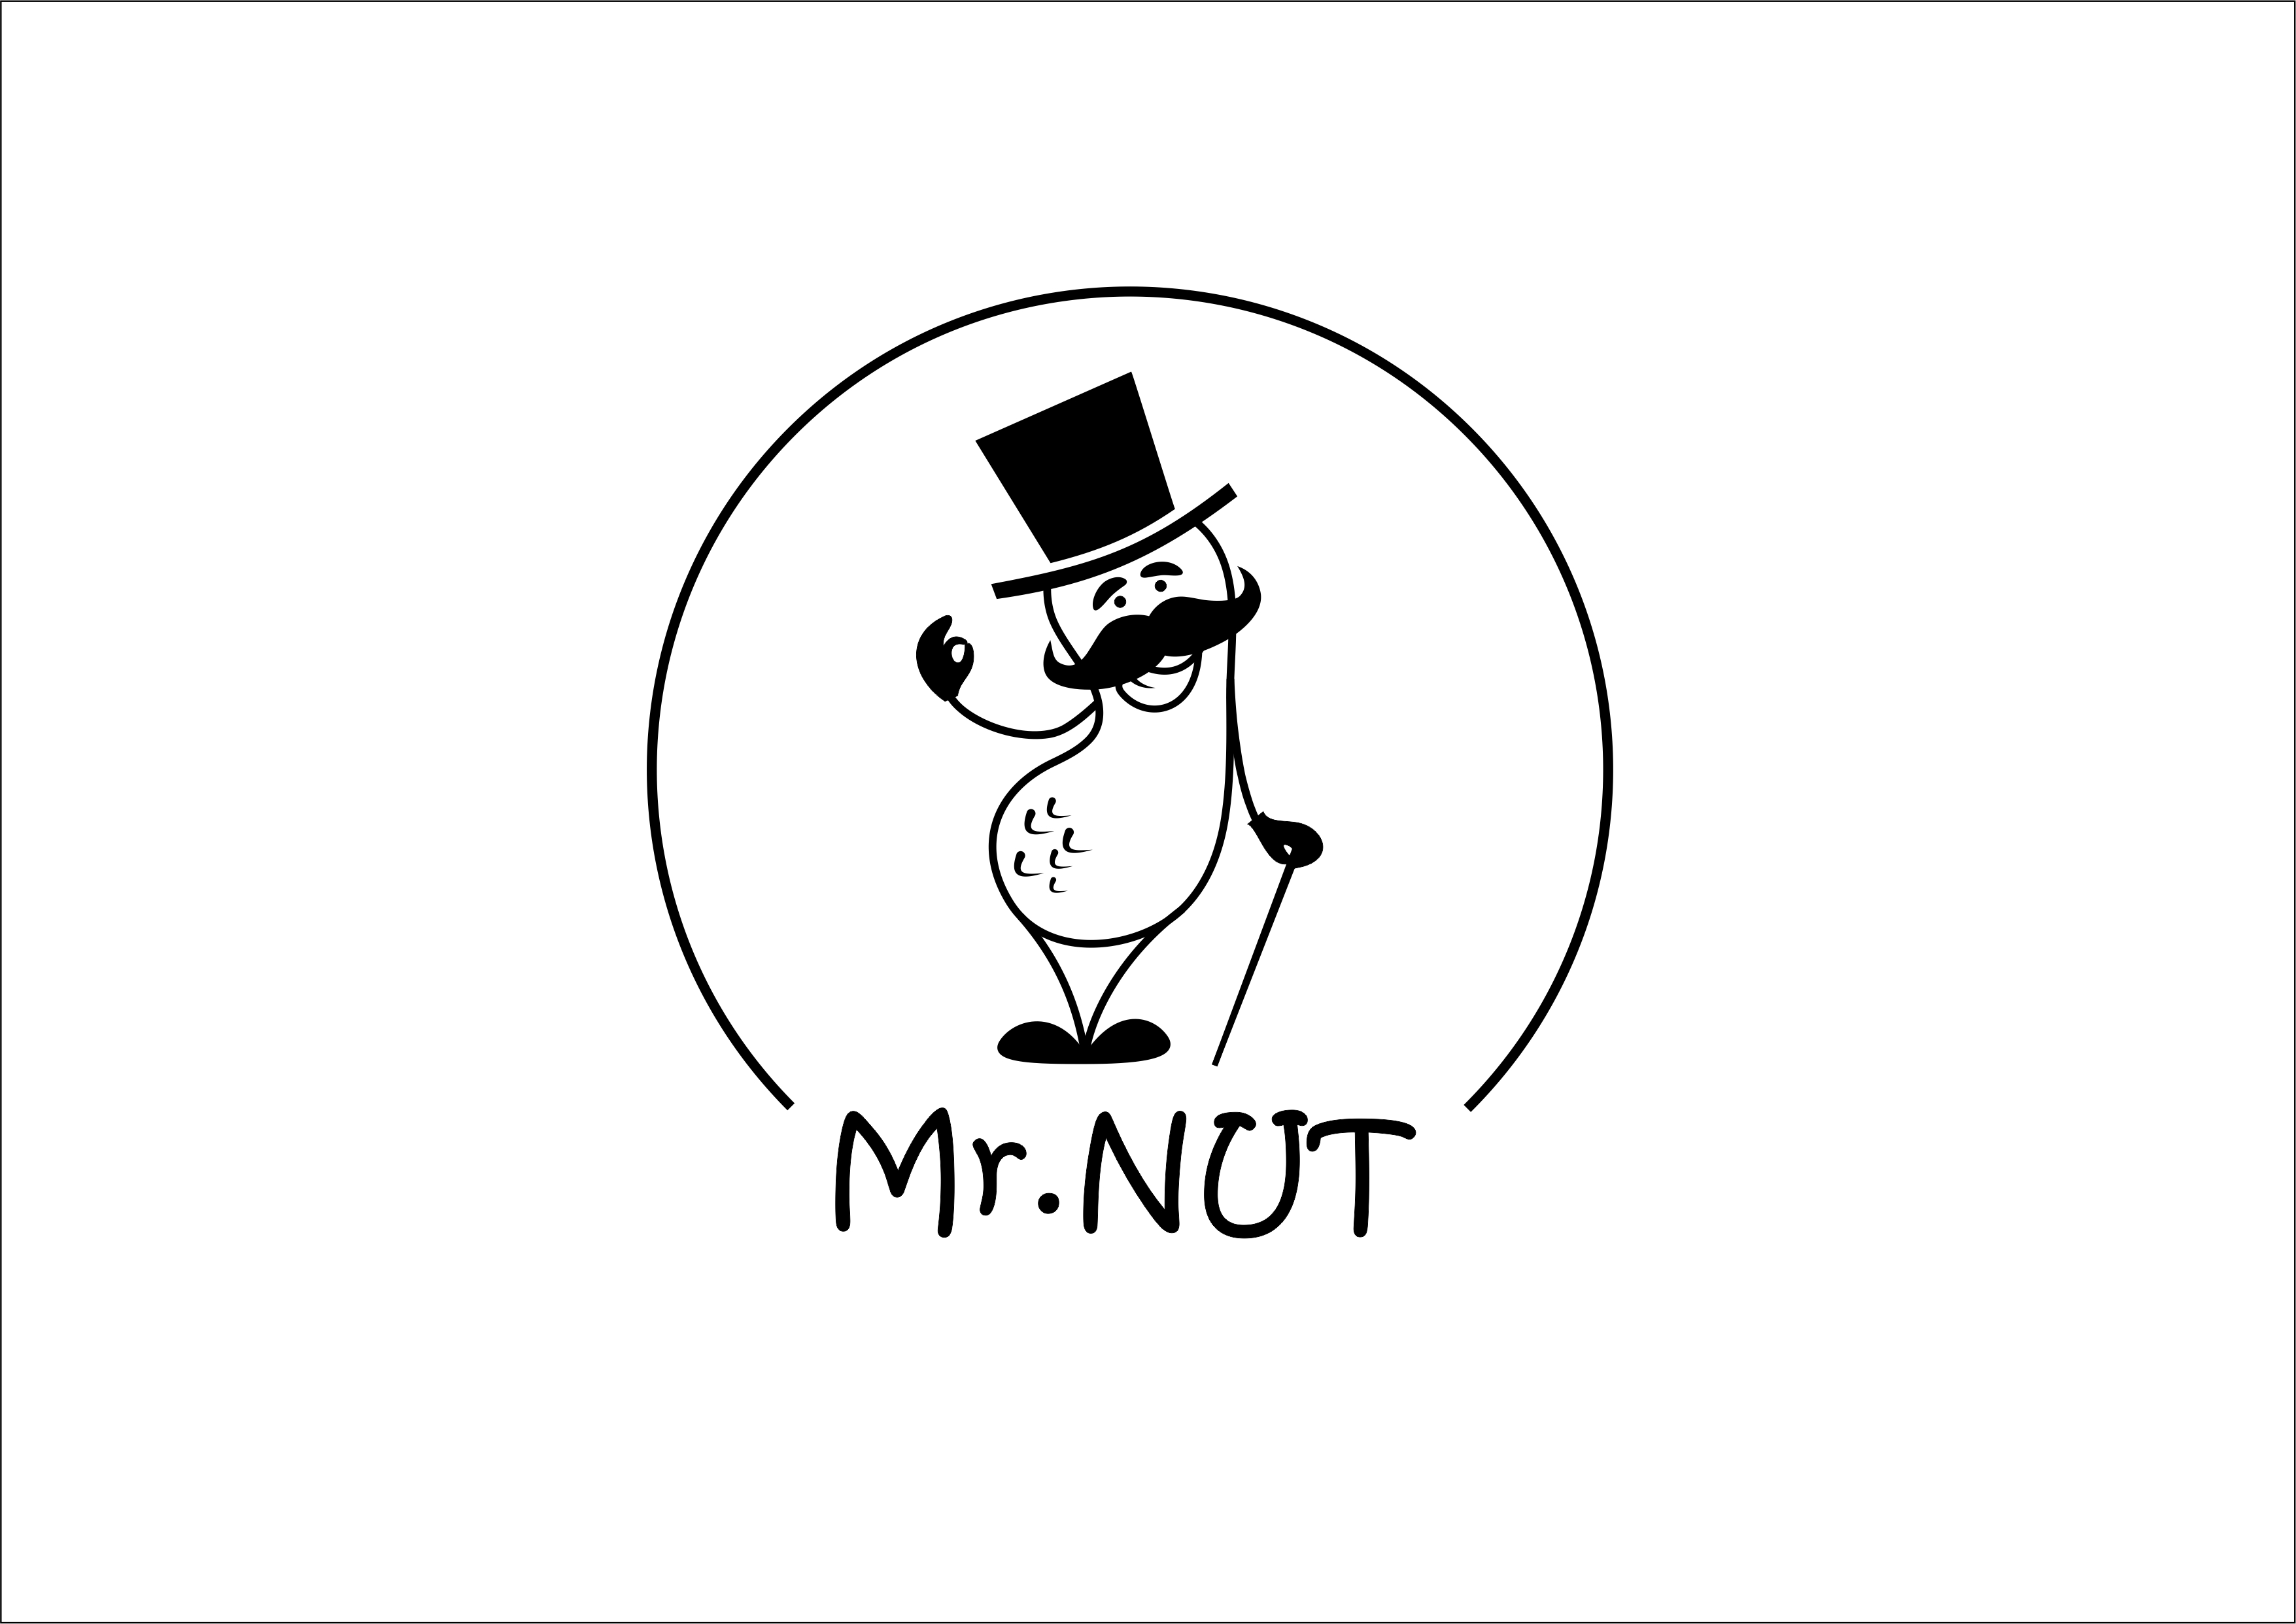 Разработать логотип и визитку фото f_49858fc9facd29cf.jpg